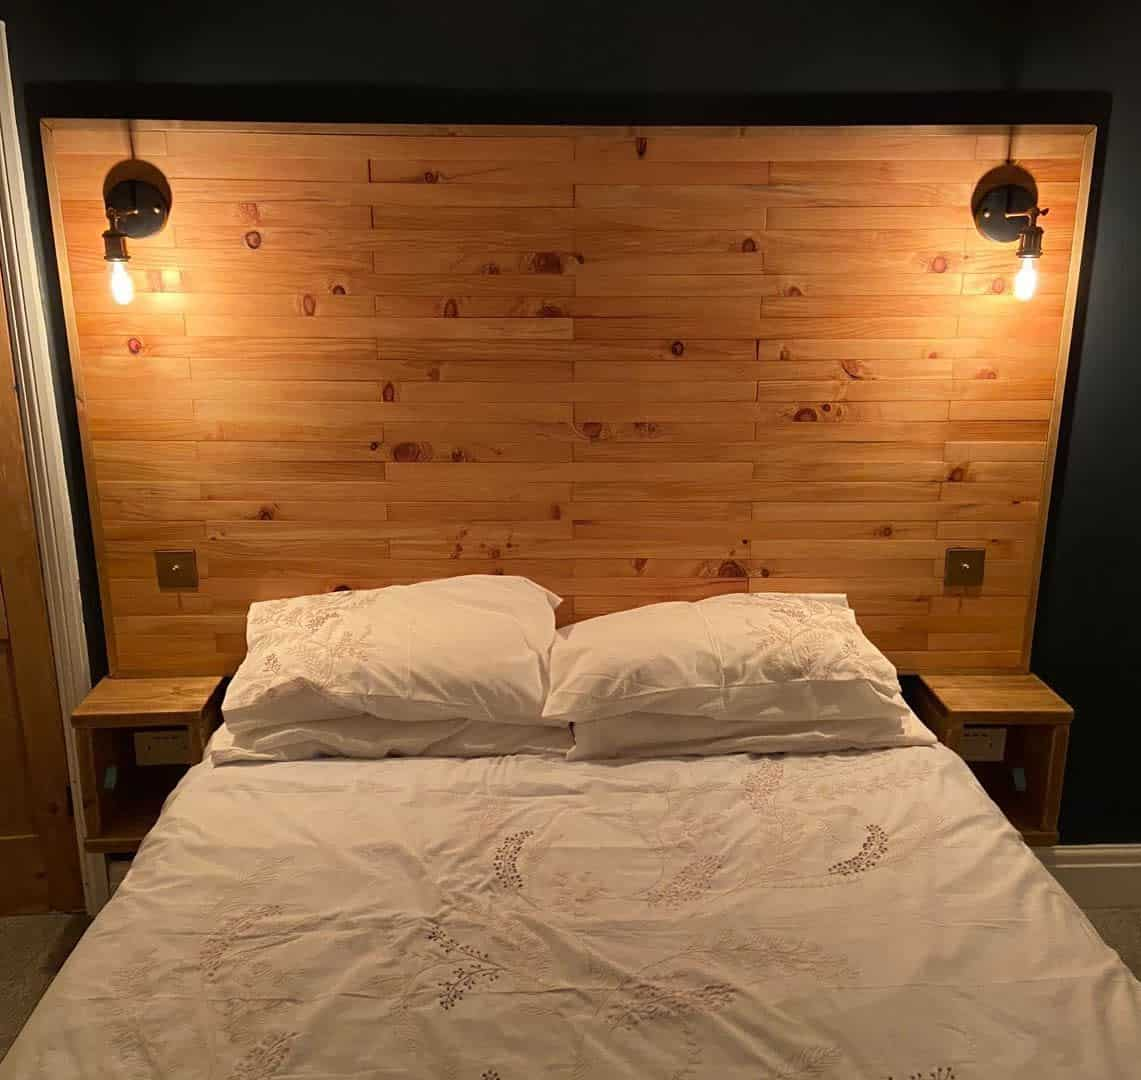 Wood DIY Headboard Ideas -rustic_reworks